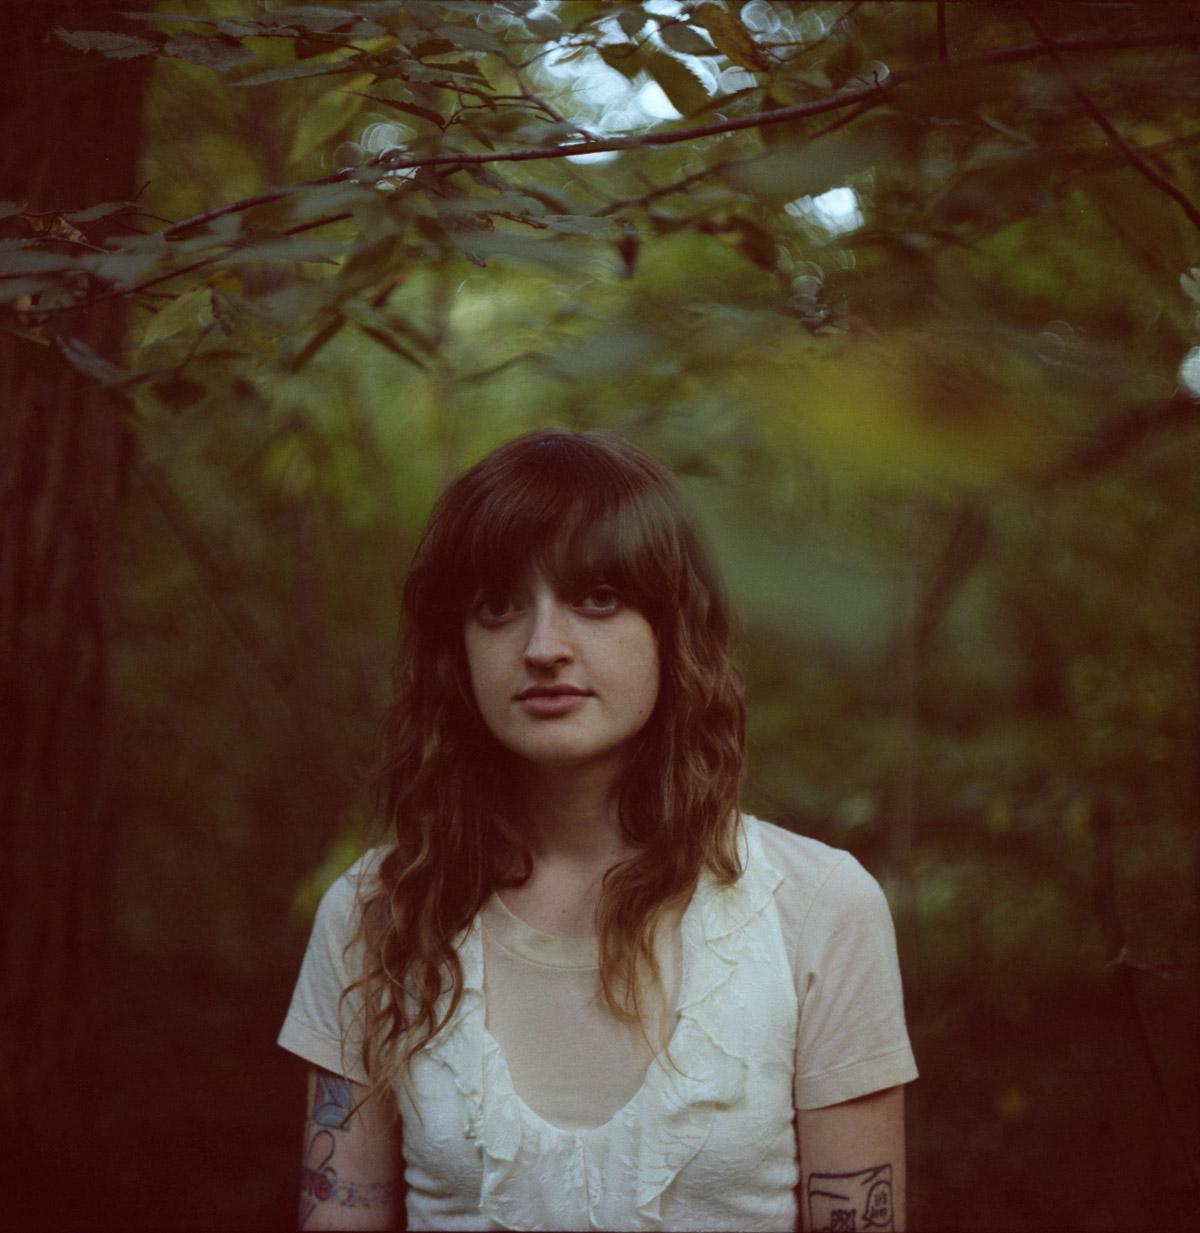 1/250 (maybe), f2.8, Kodak Portra NC 400, Pentagon Six TL - portrait of Charlotte by Elizabeth Weinberg